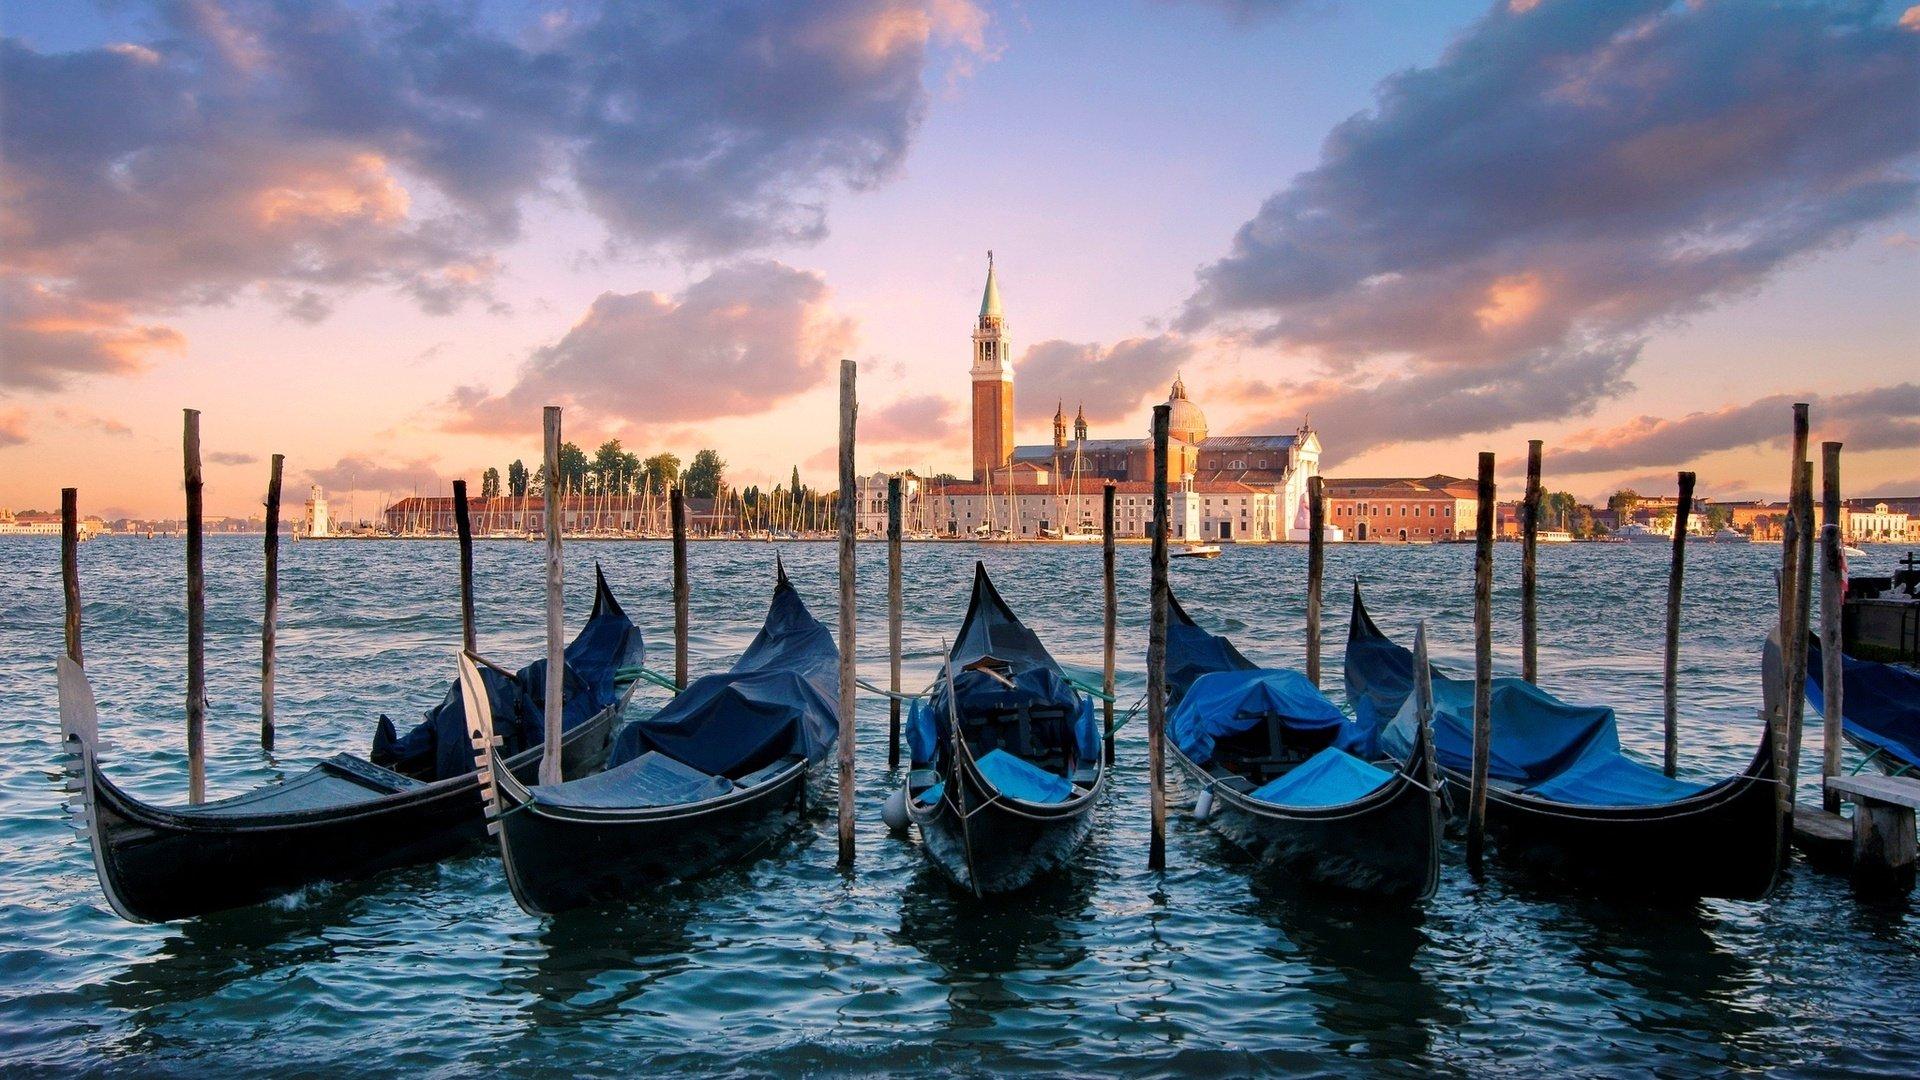 Hd wallpaper venice - Grand Canal Venice 15525 Wallpaper